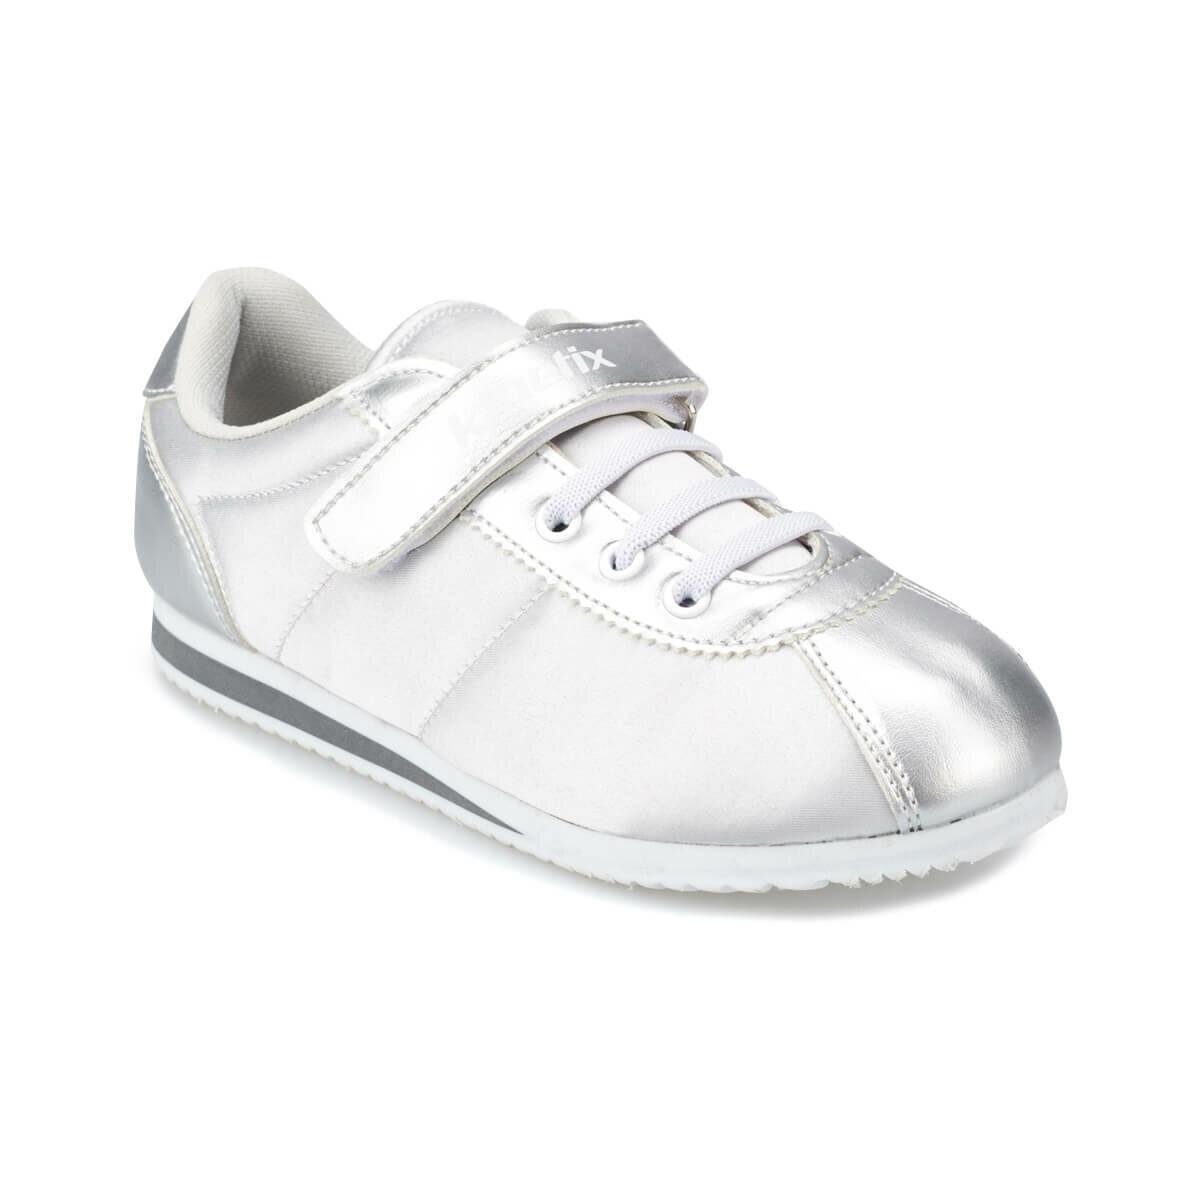 FLO SOPHY J White Male Child Sneaker Shoes KINETIX